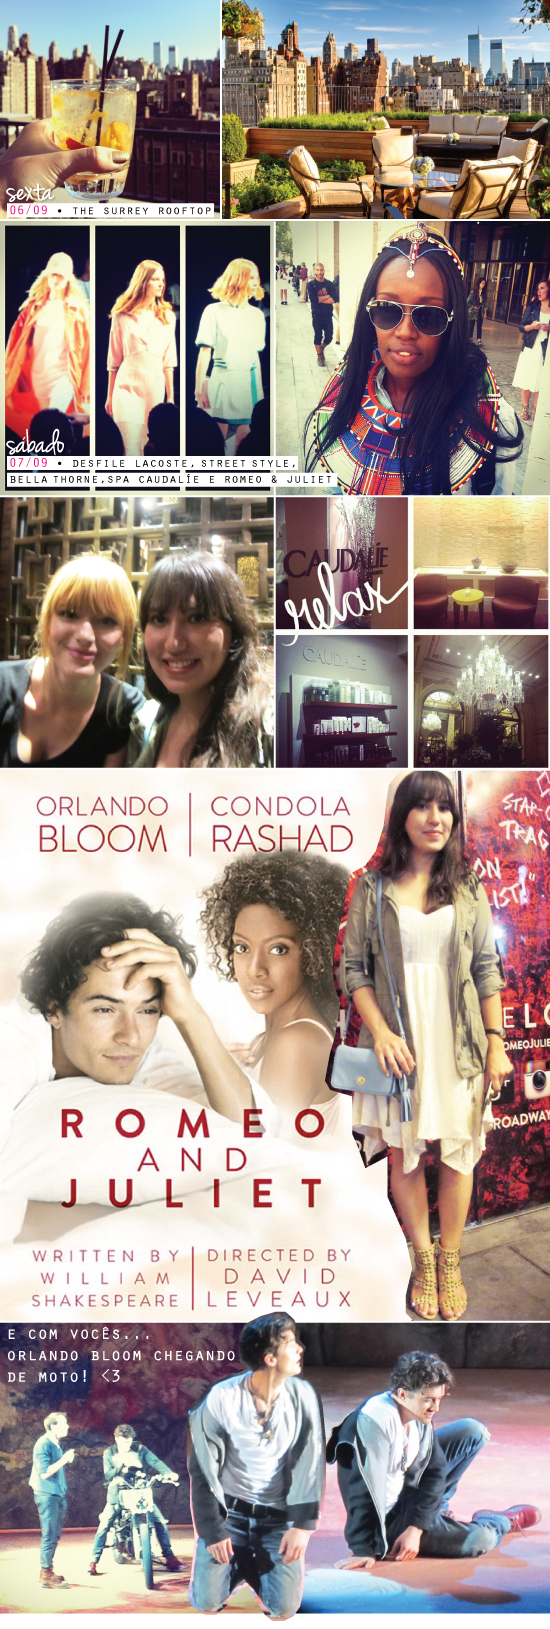 fhits-nyfw-new-york-fashion-week-spring-2014-semana-de-moda-experiencias-caudali-spa-plaza-bella-thorne-romeo-juliet-broadway-orlando-bloom-dumond-sandalia-look-rooftop-surrey-hotel-lacoste-street-style-dvf-edie-parker-five-story-kirna-zabete-farfetch-brasil-tour-linea-restaurante-organico-one-lucky-duck-trip-travel-showroom